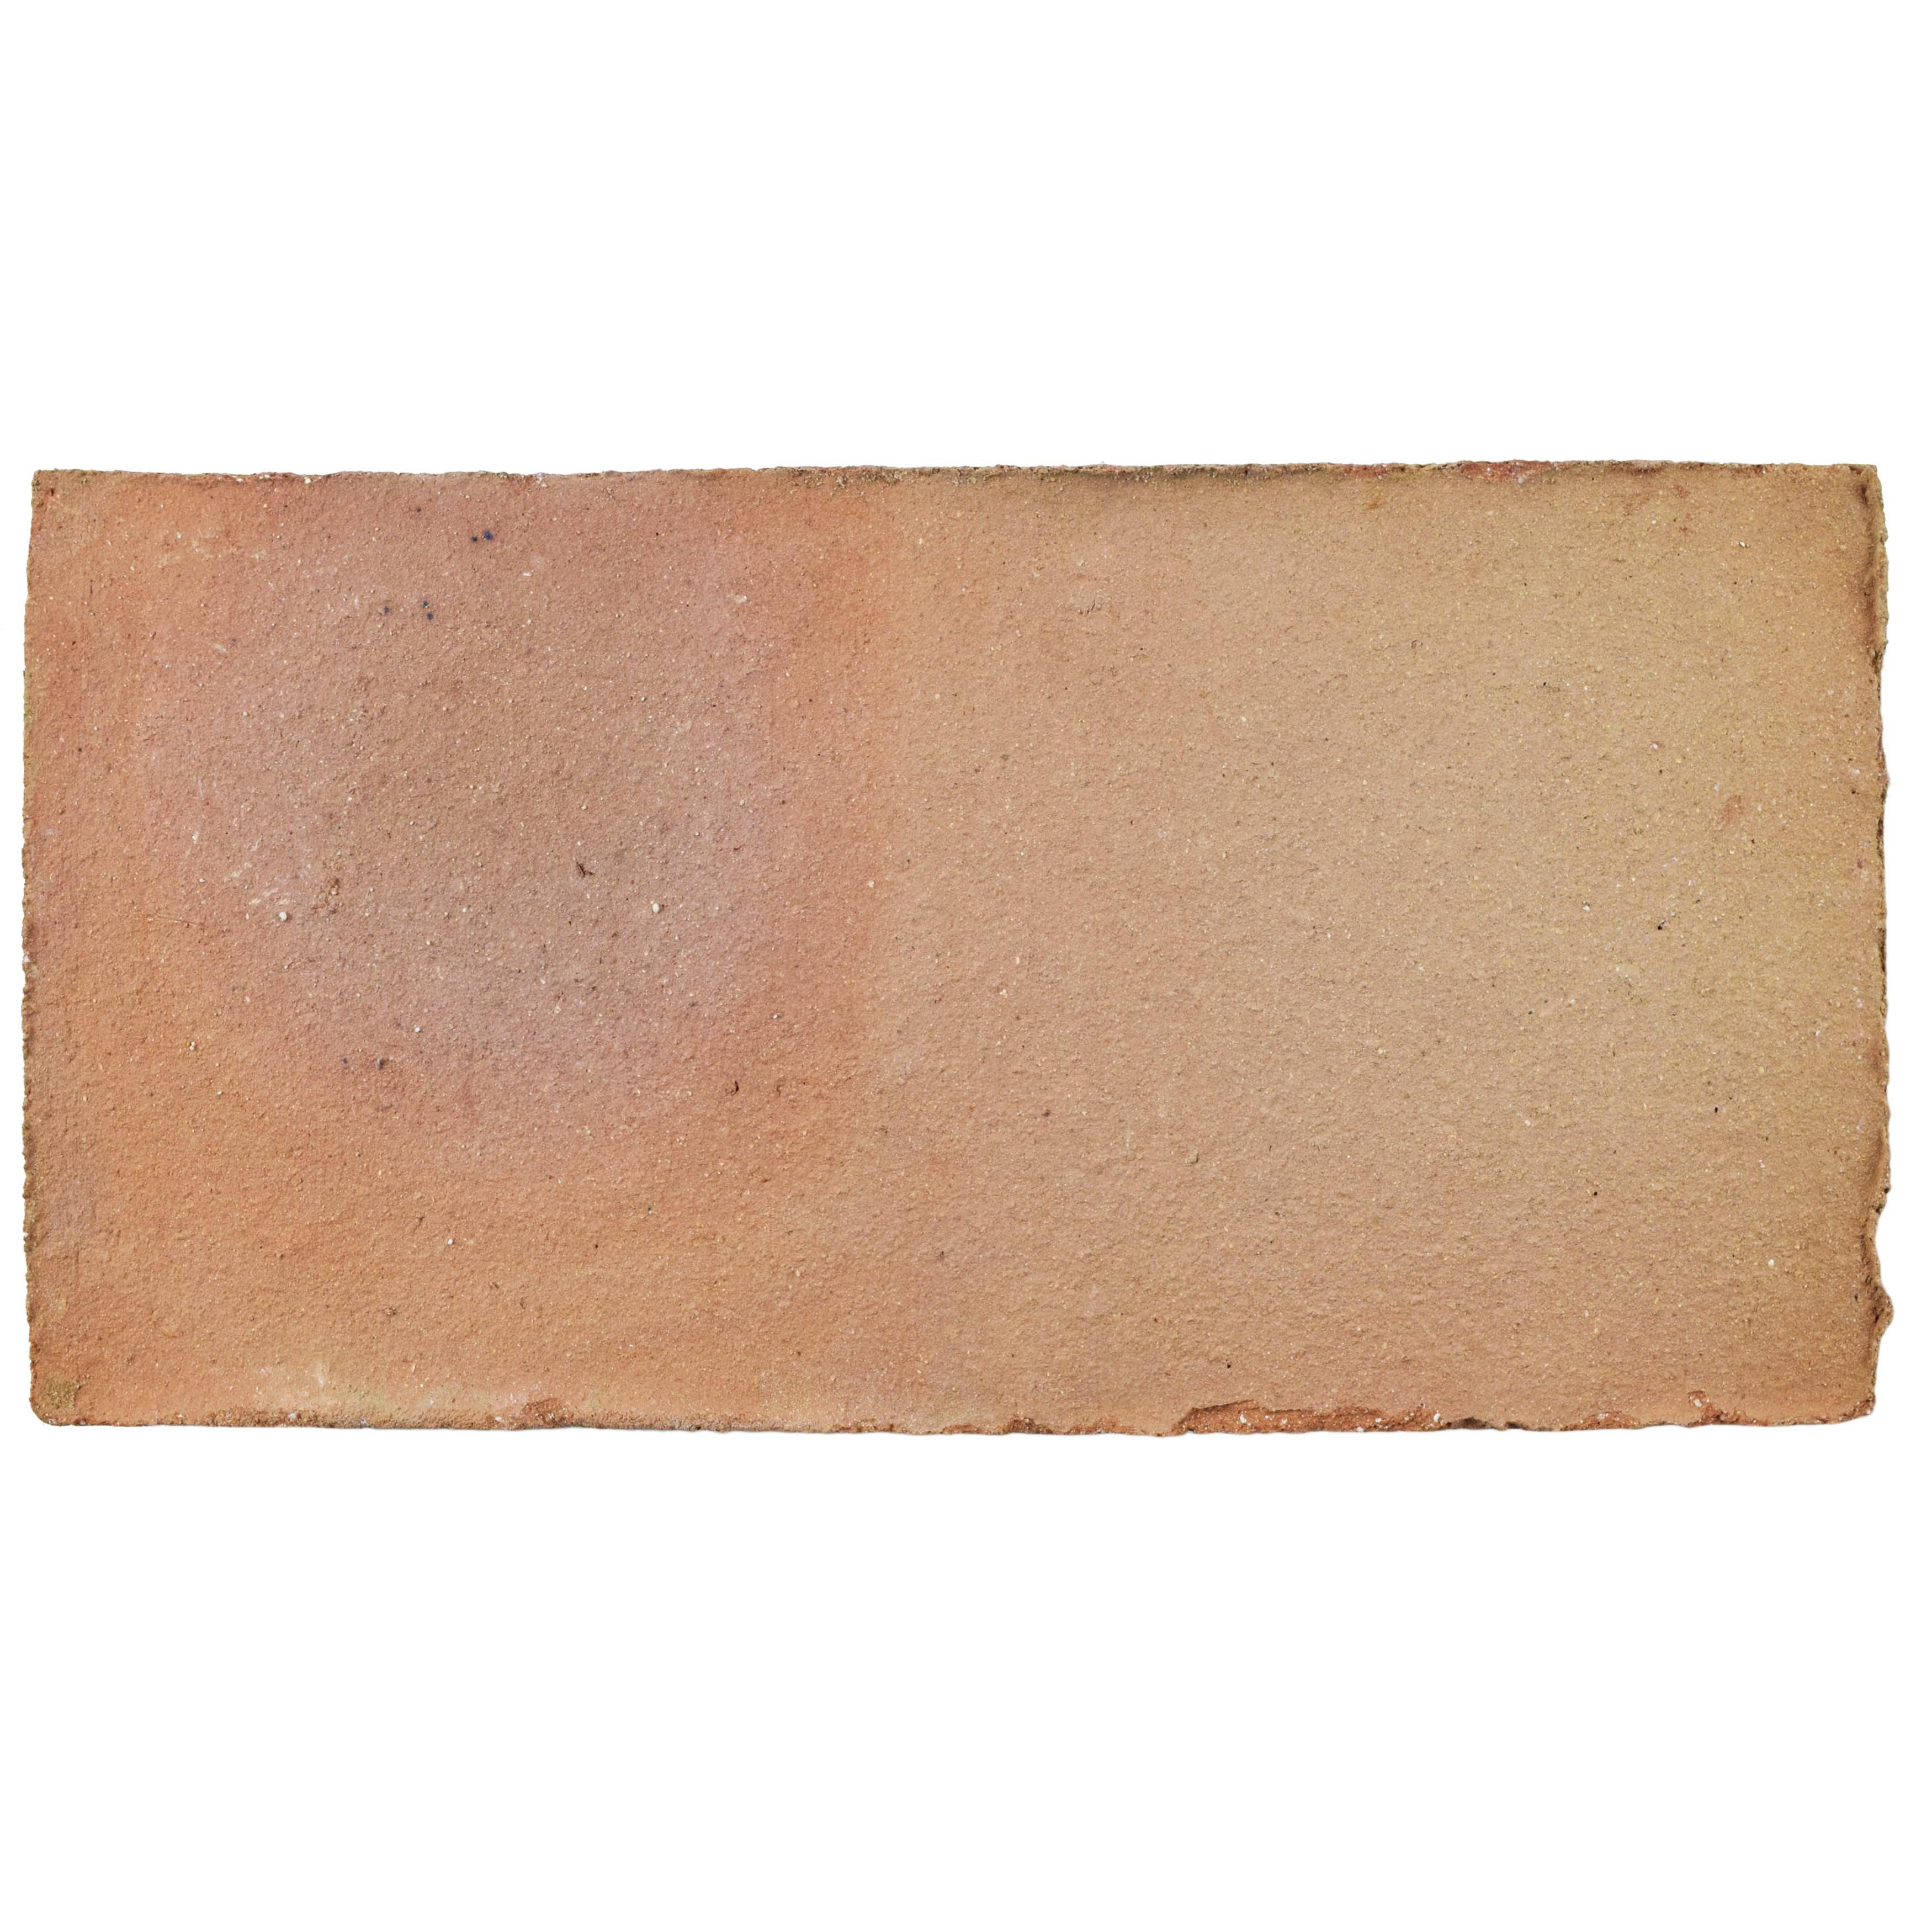 2 Flooring Tiles in Pakistan Rectangular Shape Terracotta Floor Tiles Designs Images.